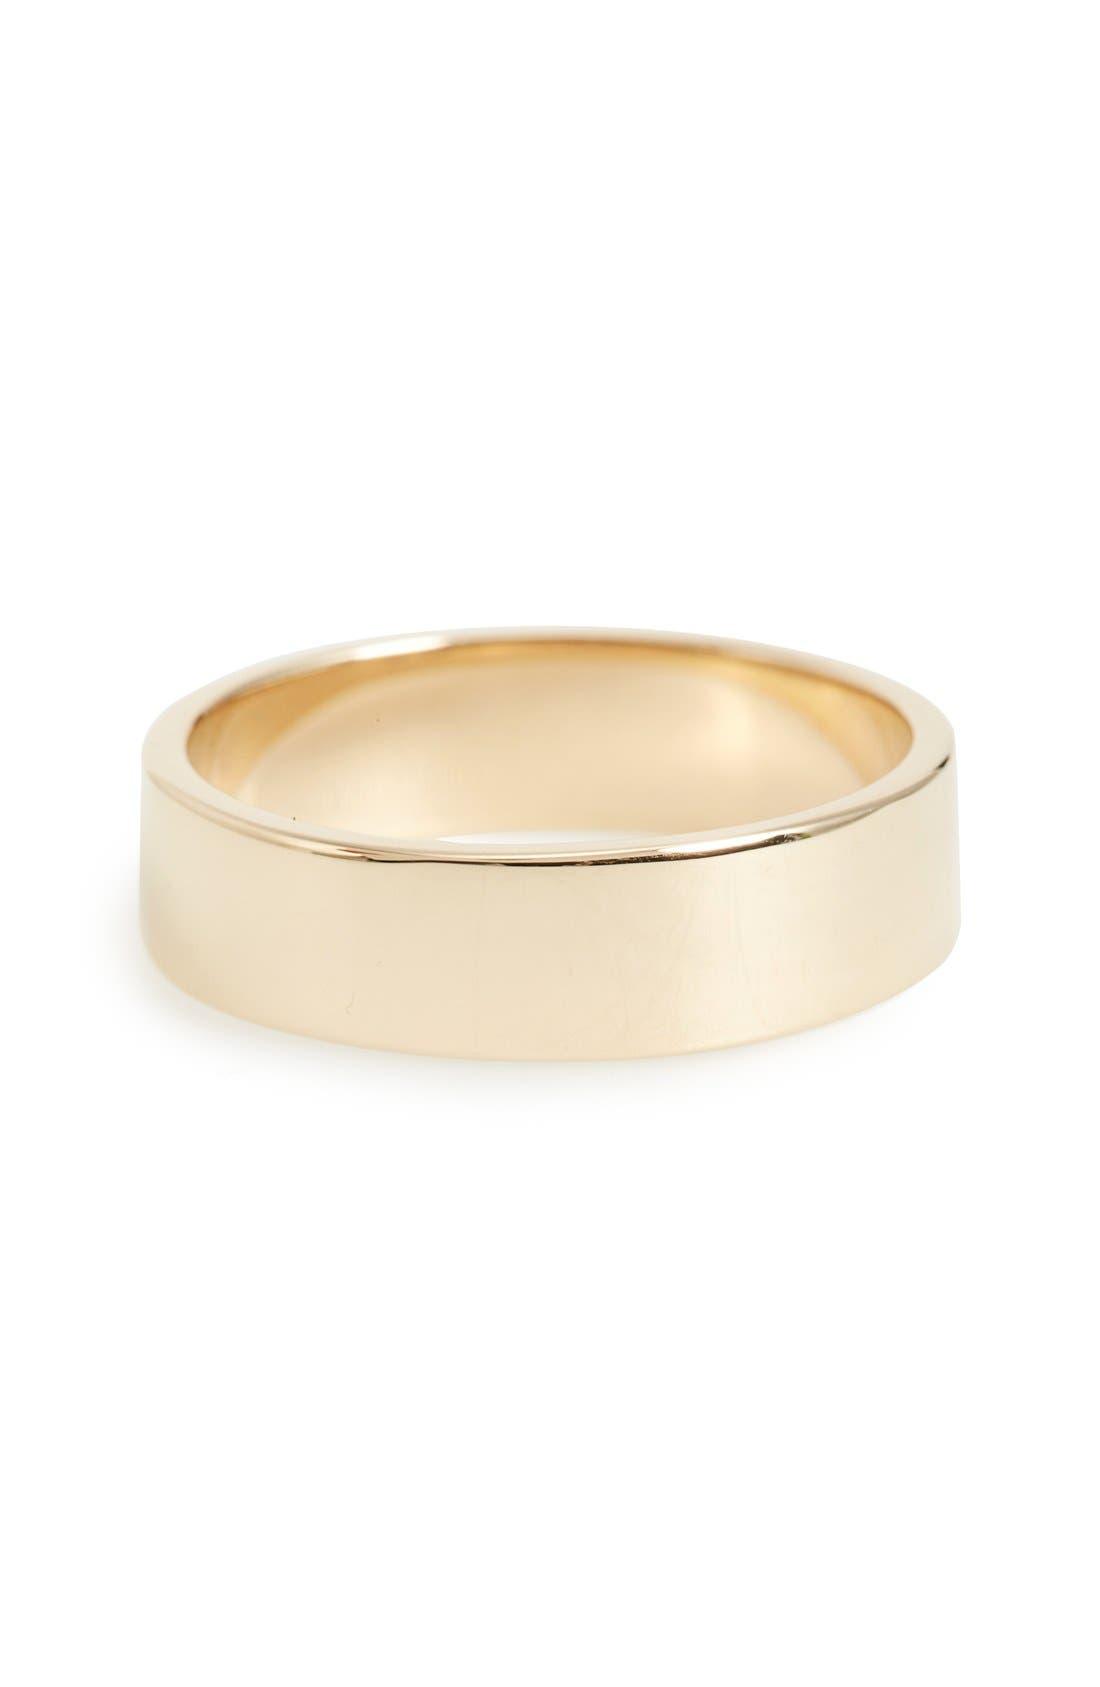 Harmony<sup>®</sup> Flat Classic 5mm Shiny Band Ring,                             Main thumbnail 1, color,                             Yellow